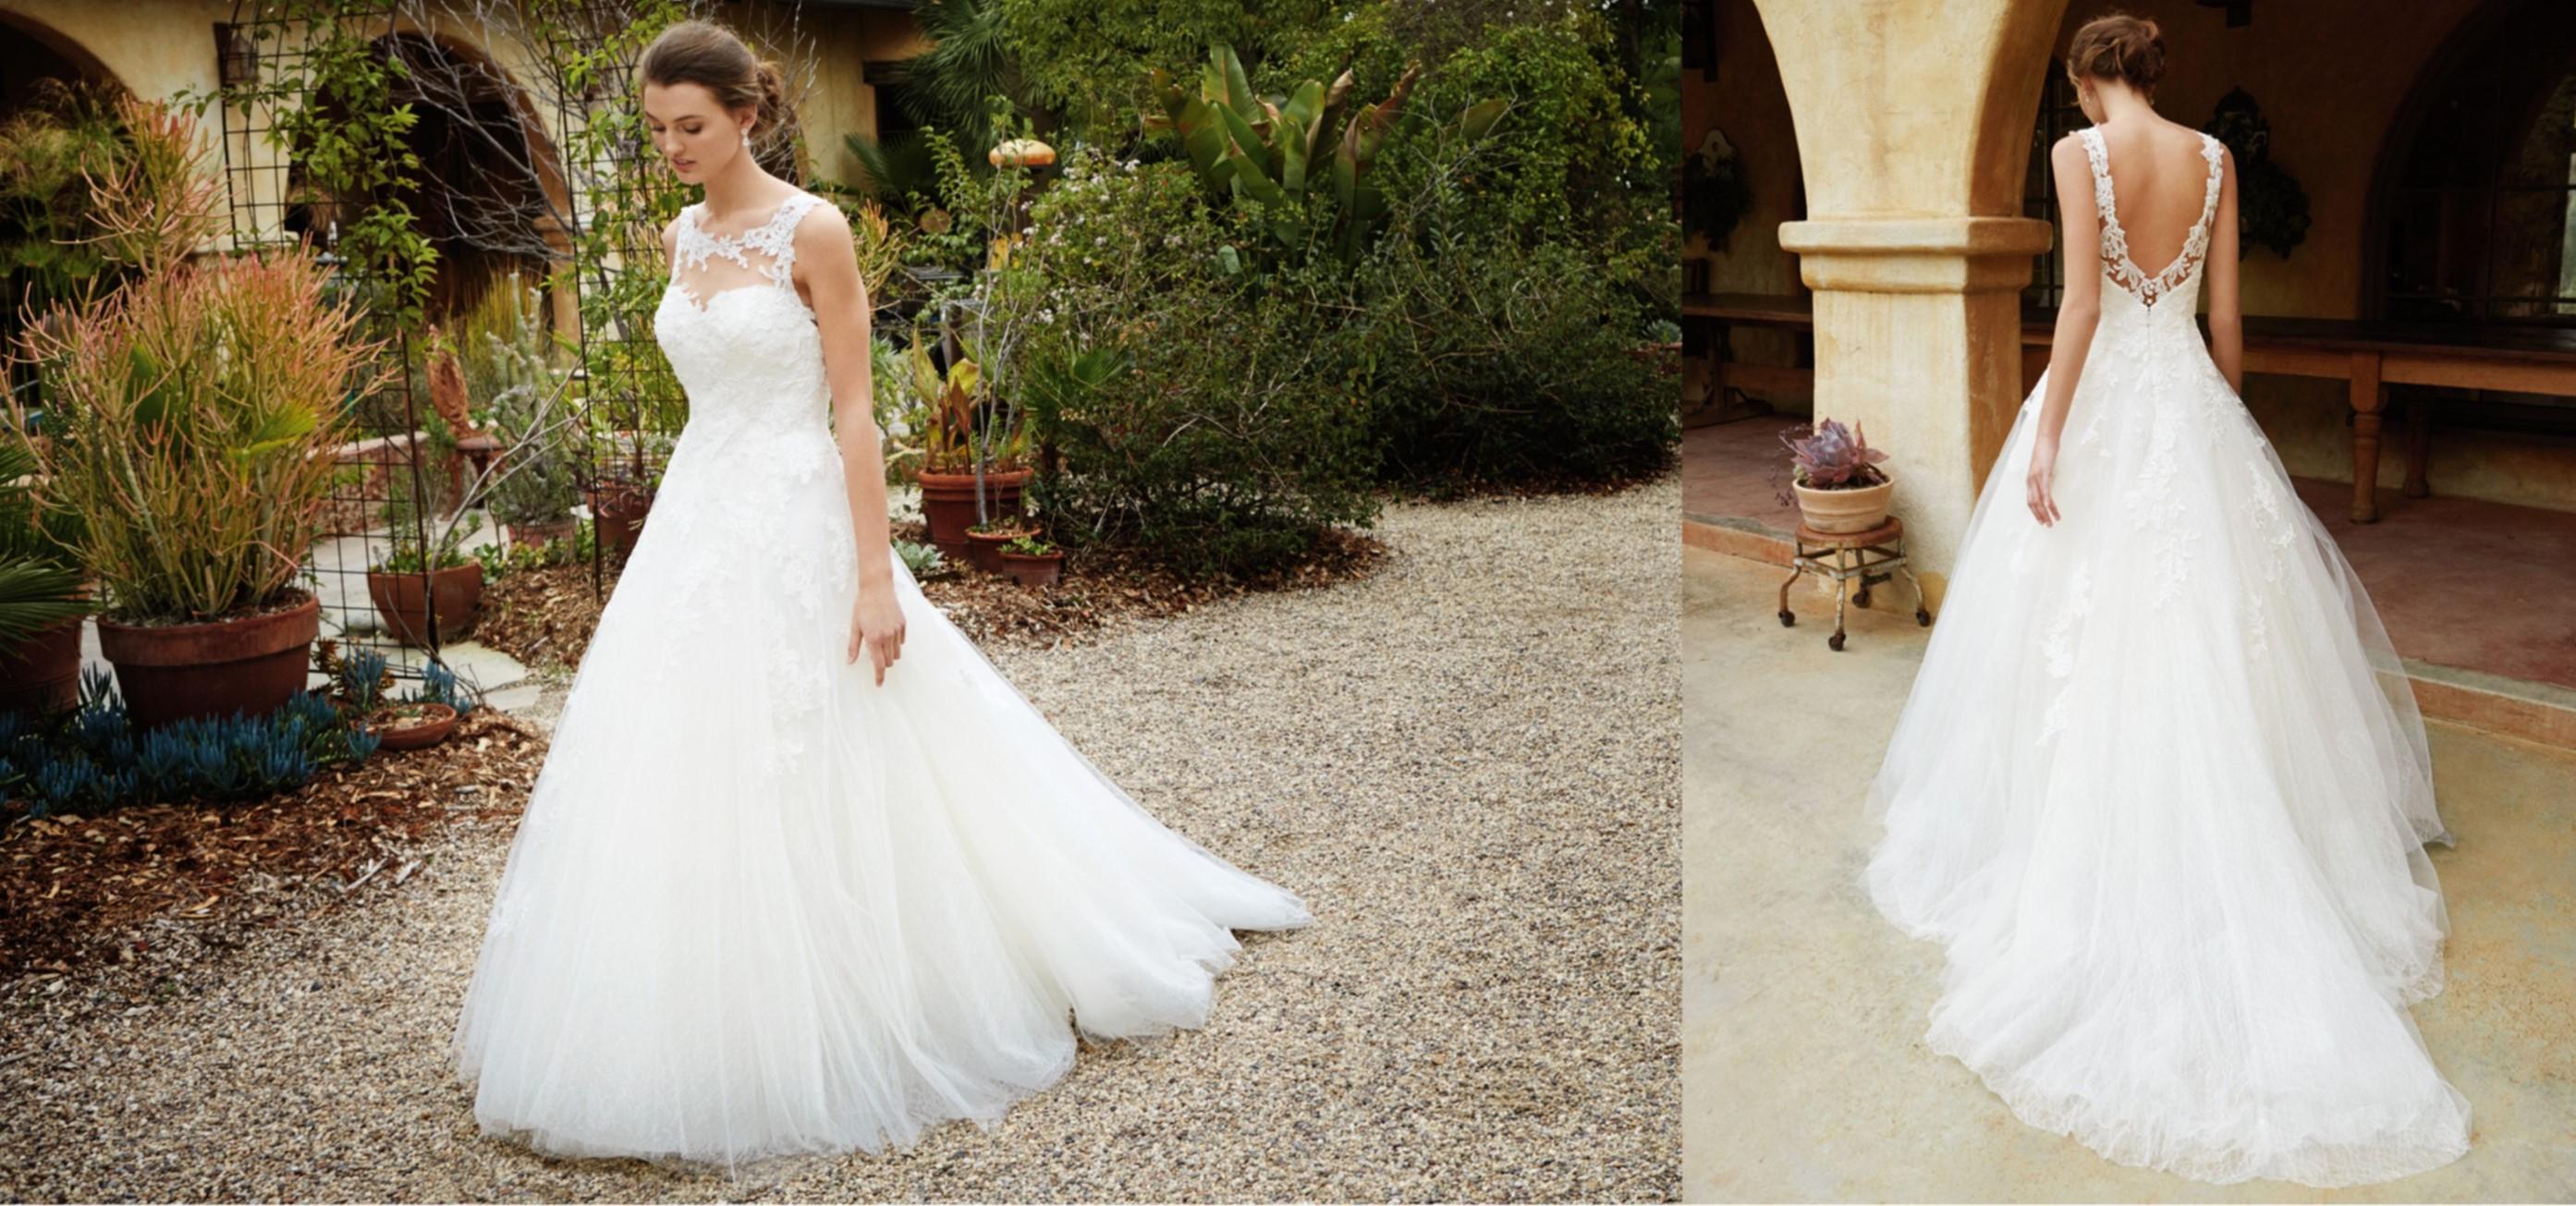 Sposabella Bridal Gowns Durban